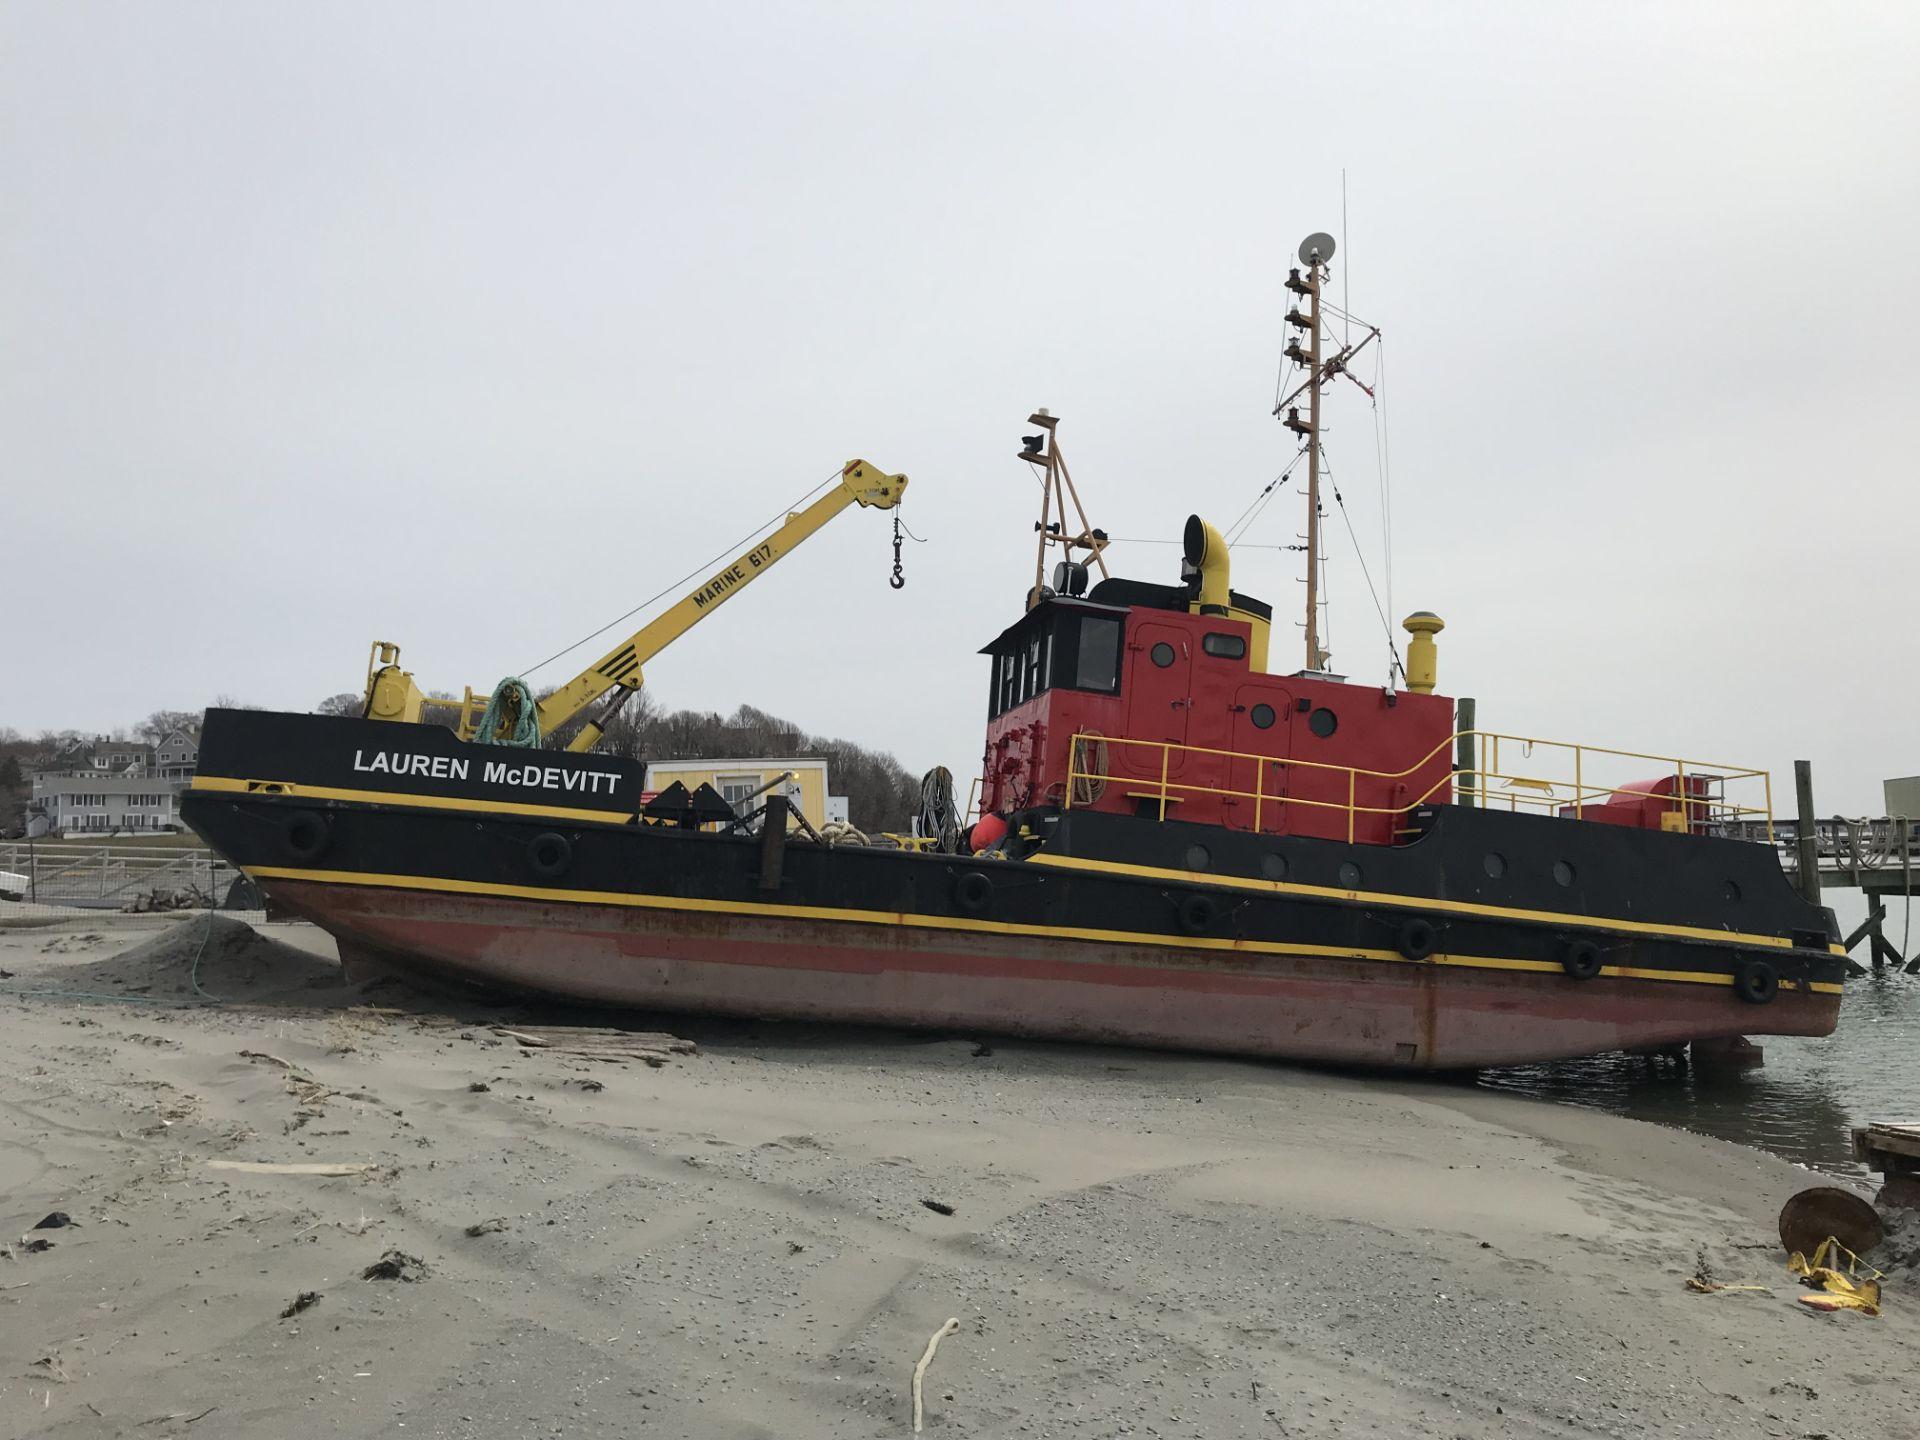 Lot 0 - 25' PUSH BOAT - 45' CREW BOAT - 73' TUGBOAT - (2) OCEAN BARGES - MARINE EQUIPMENT